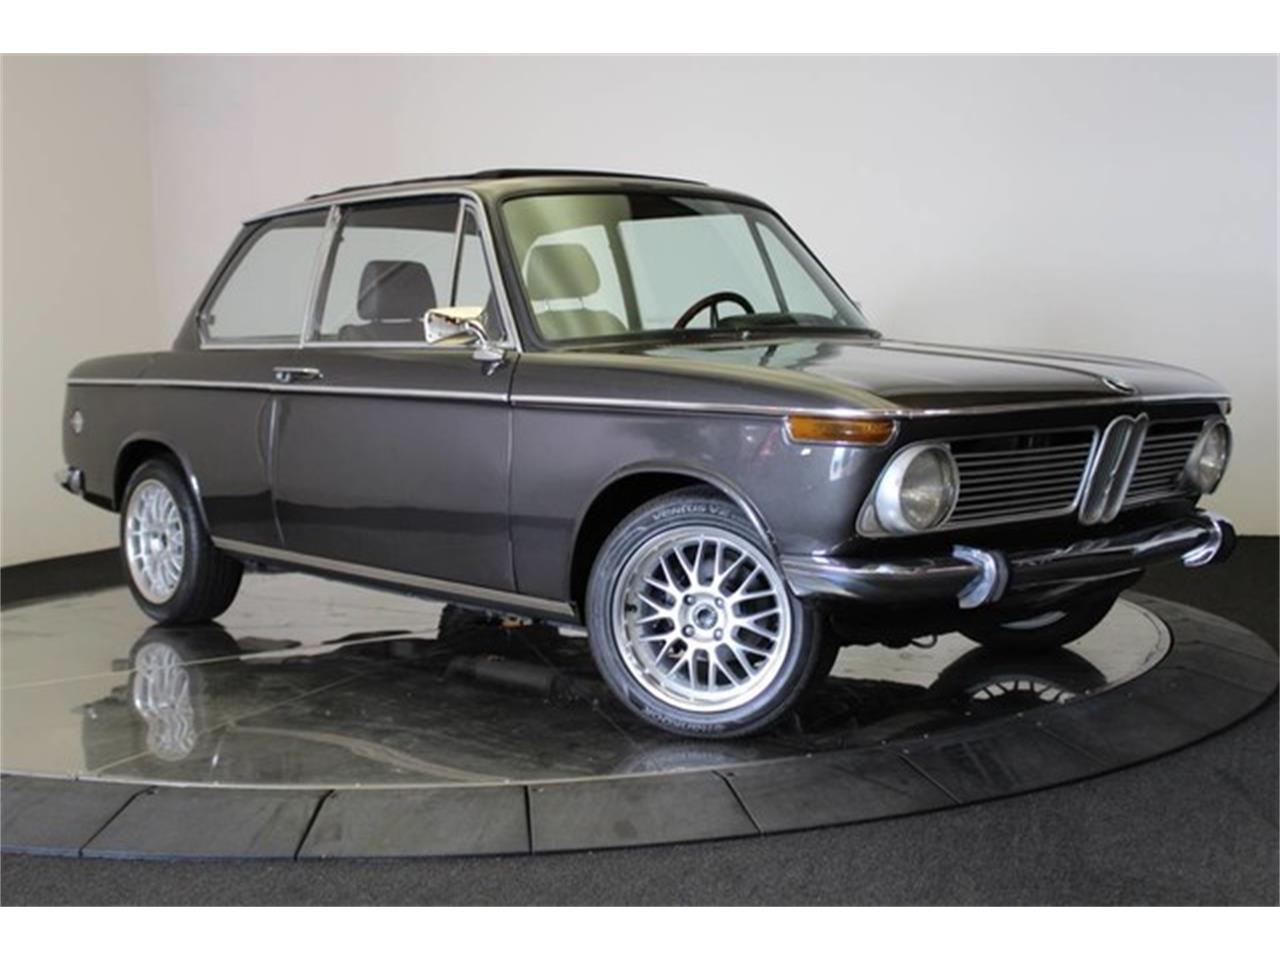 Bmw 2002 For Sale >> 1968 Bmw 2002 For Sale Classiccars Com Cc 939944